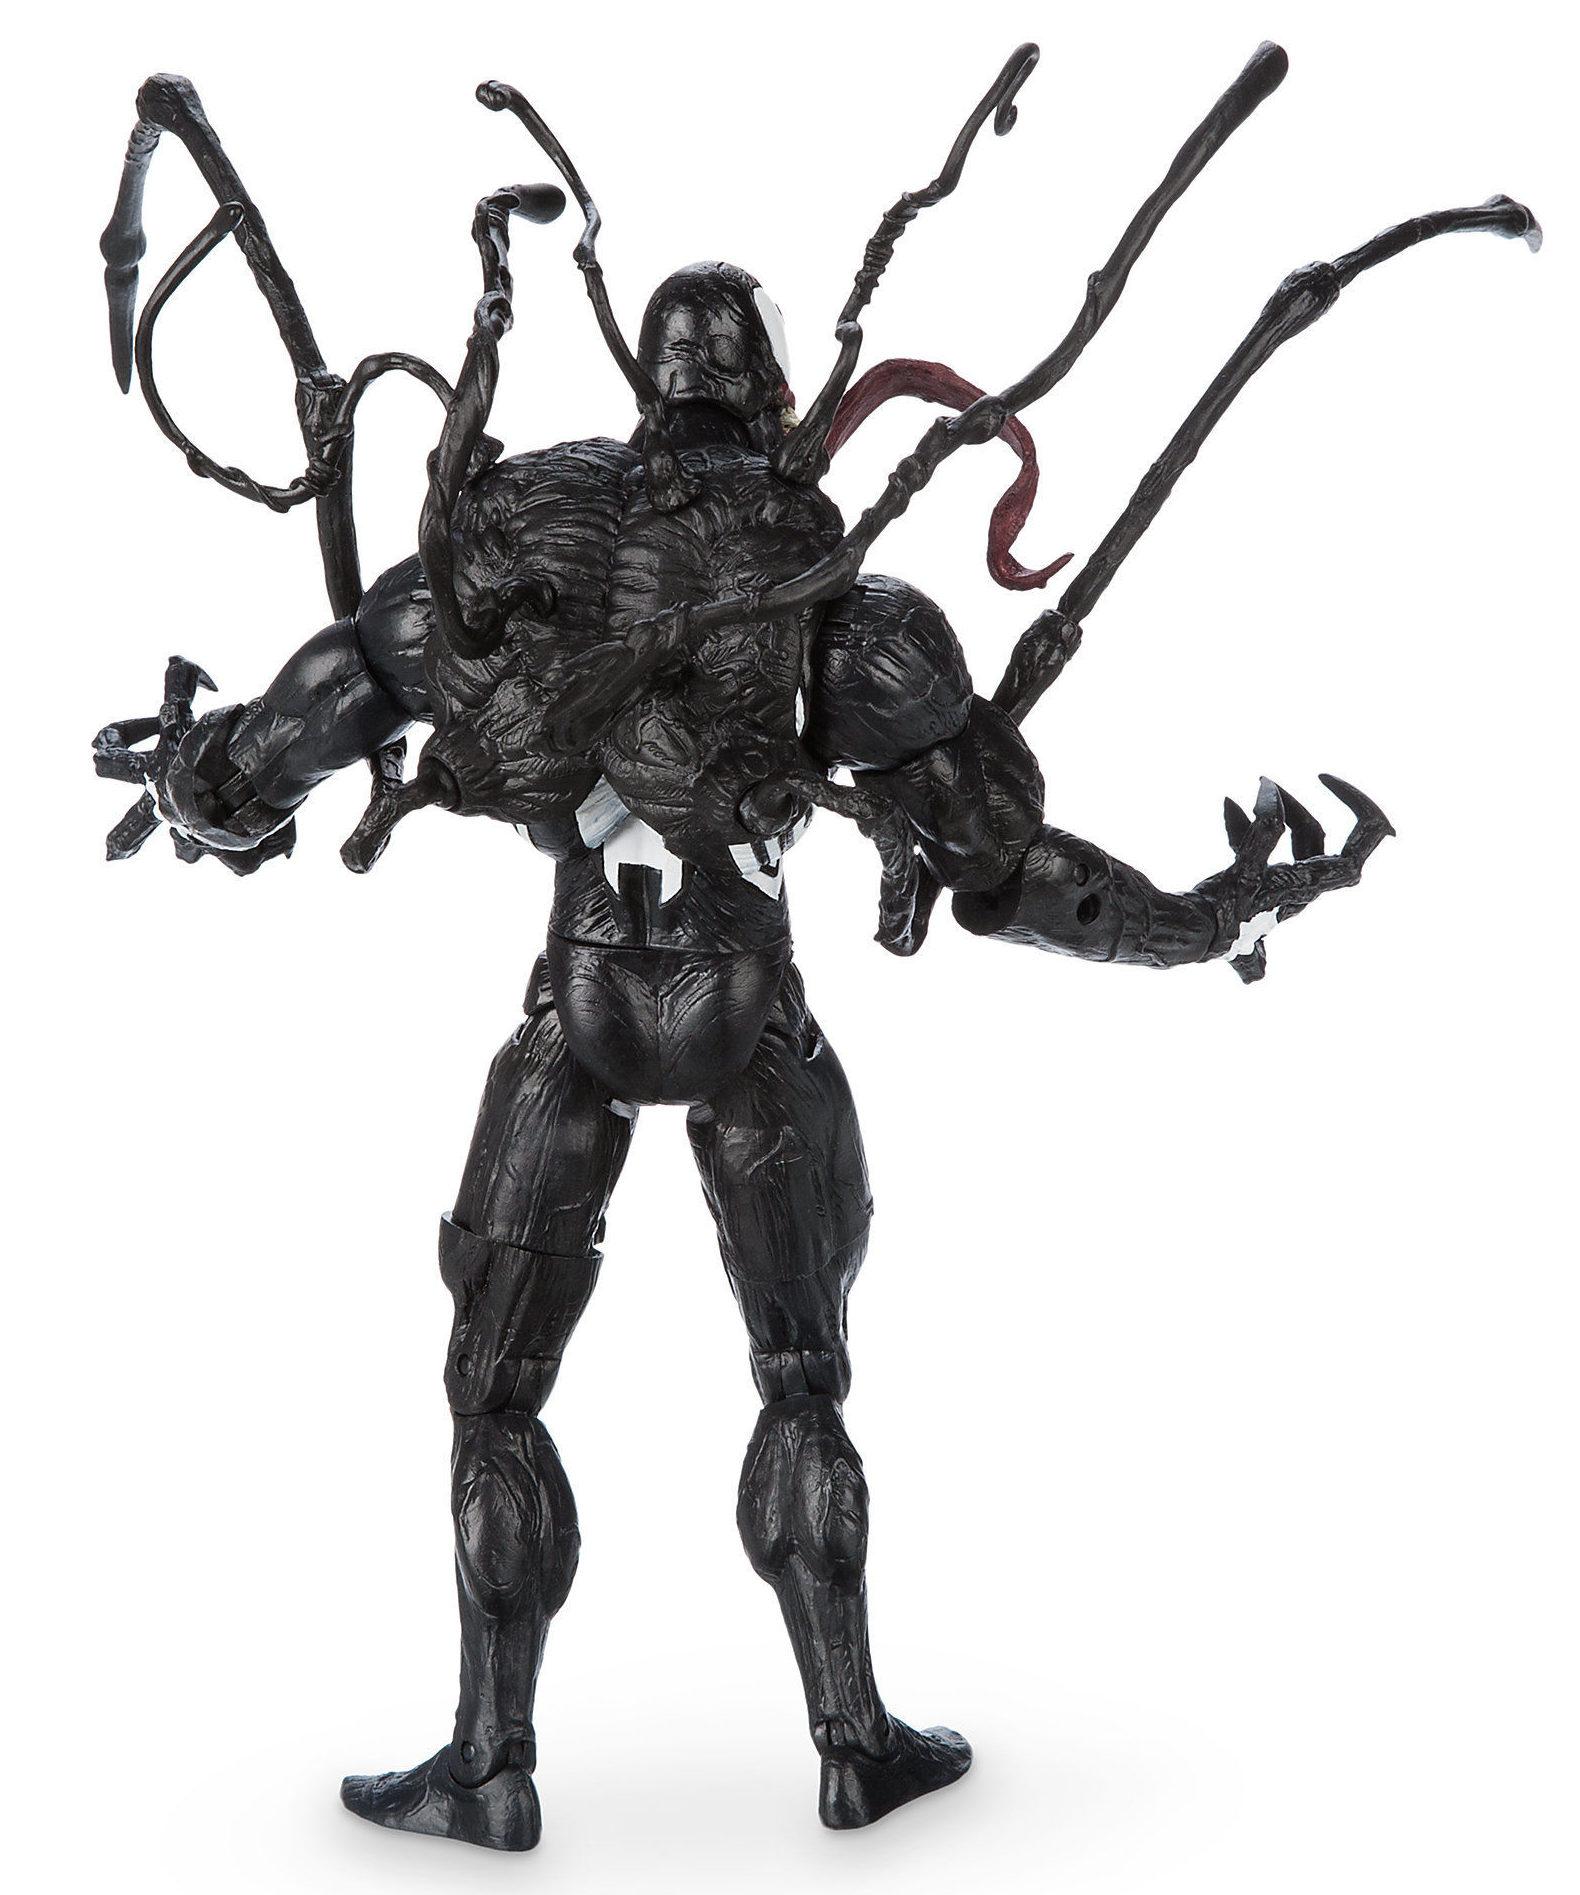 Exclusive Marvel Select Venom Figure Up for Order! DST 2018